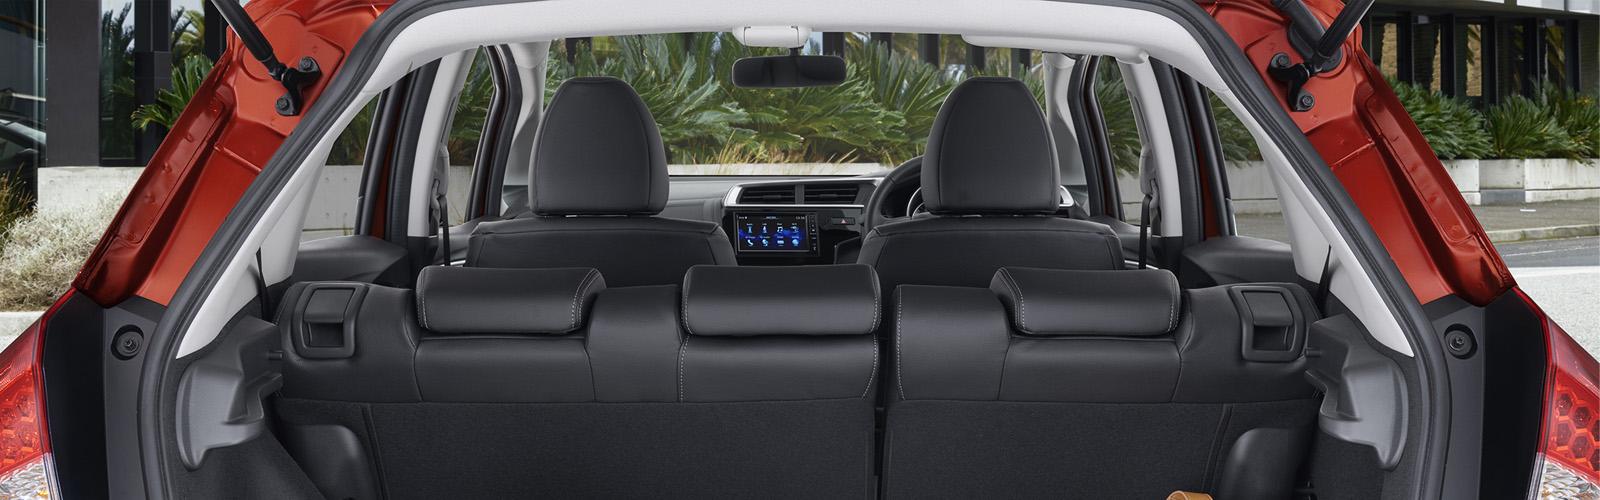 New Honda Jazz for sale in Brisbane - Cricks Highway Honda